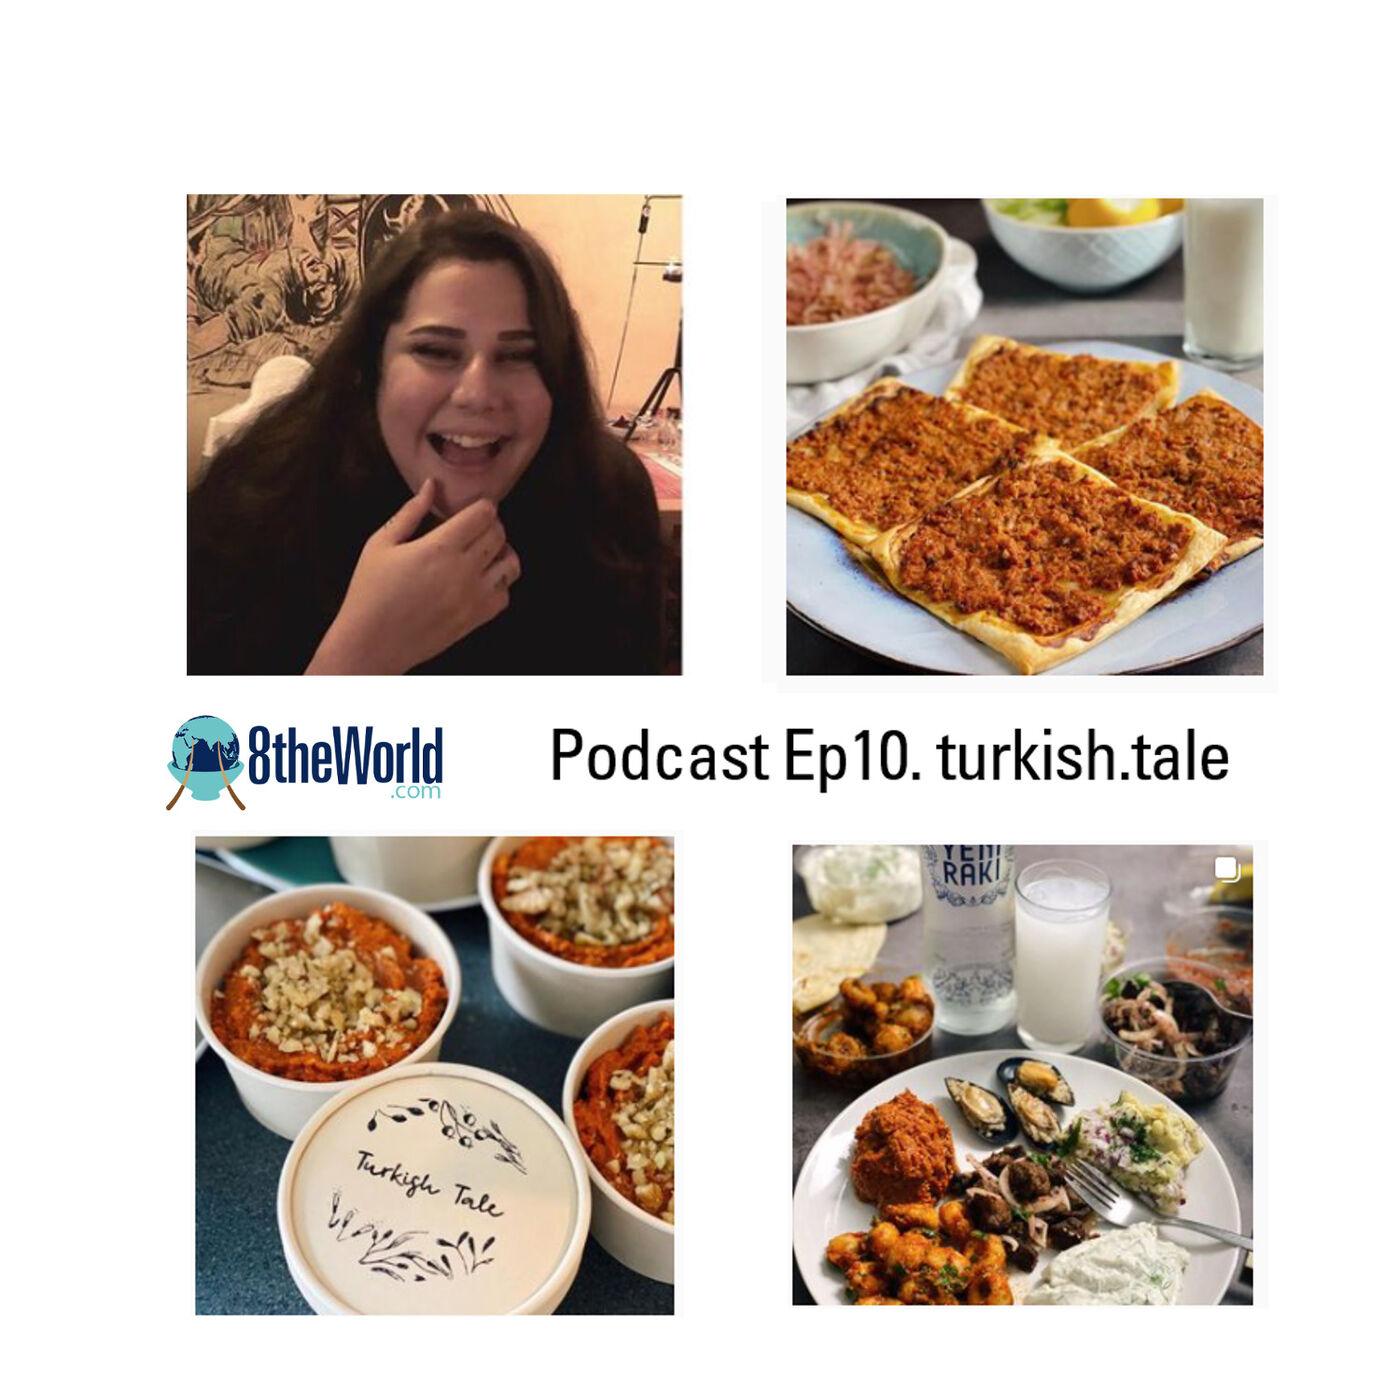 Ep 10. Hale - turkish.tale